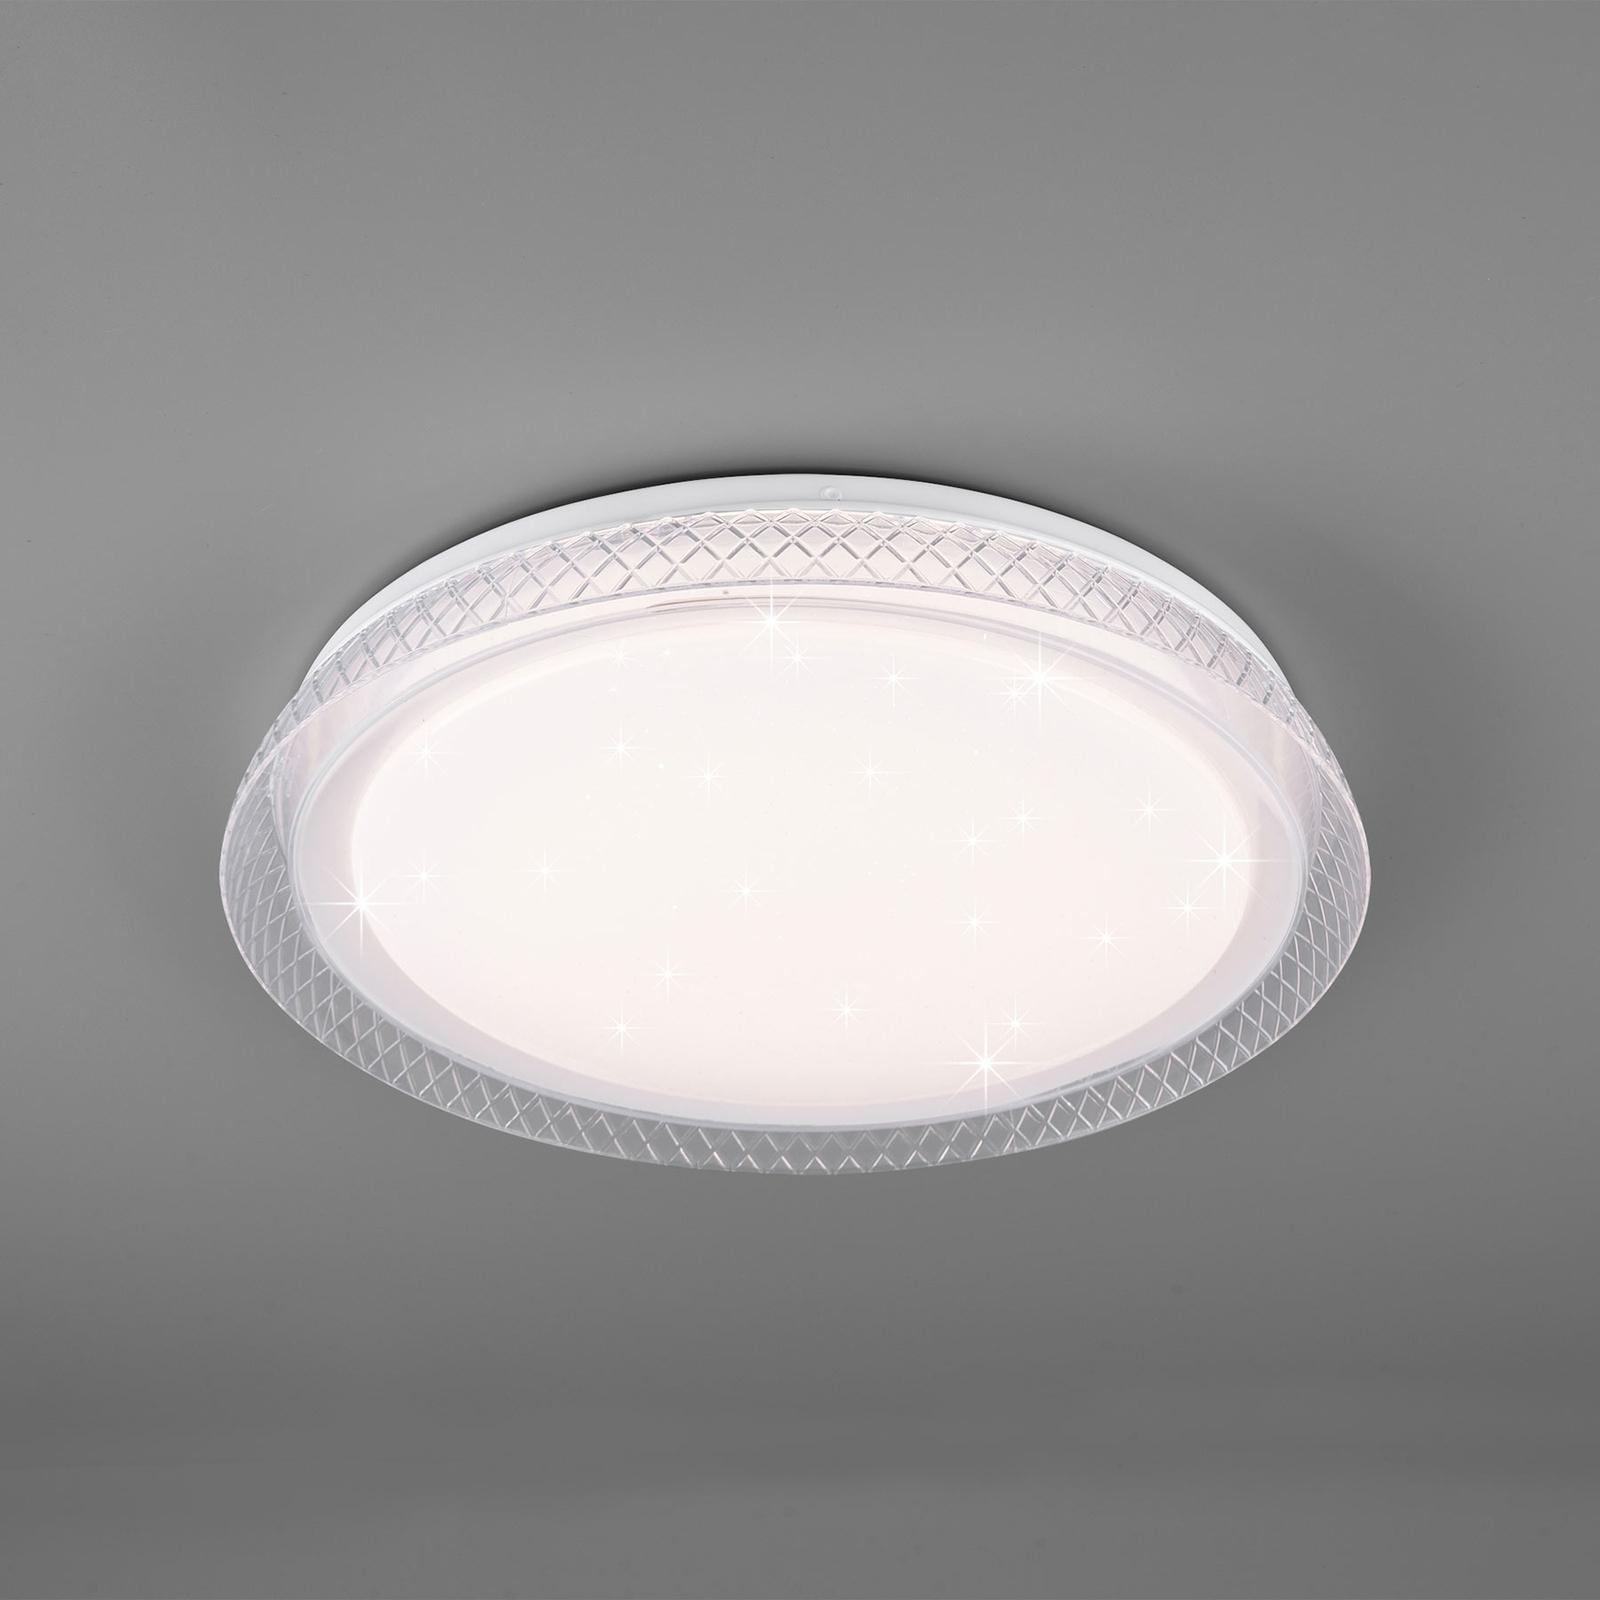 Lampa sufitowa LED Heracles, tunable white, Ø 38cm